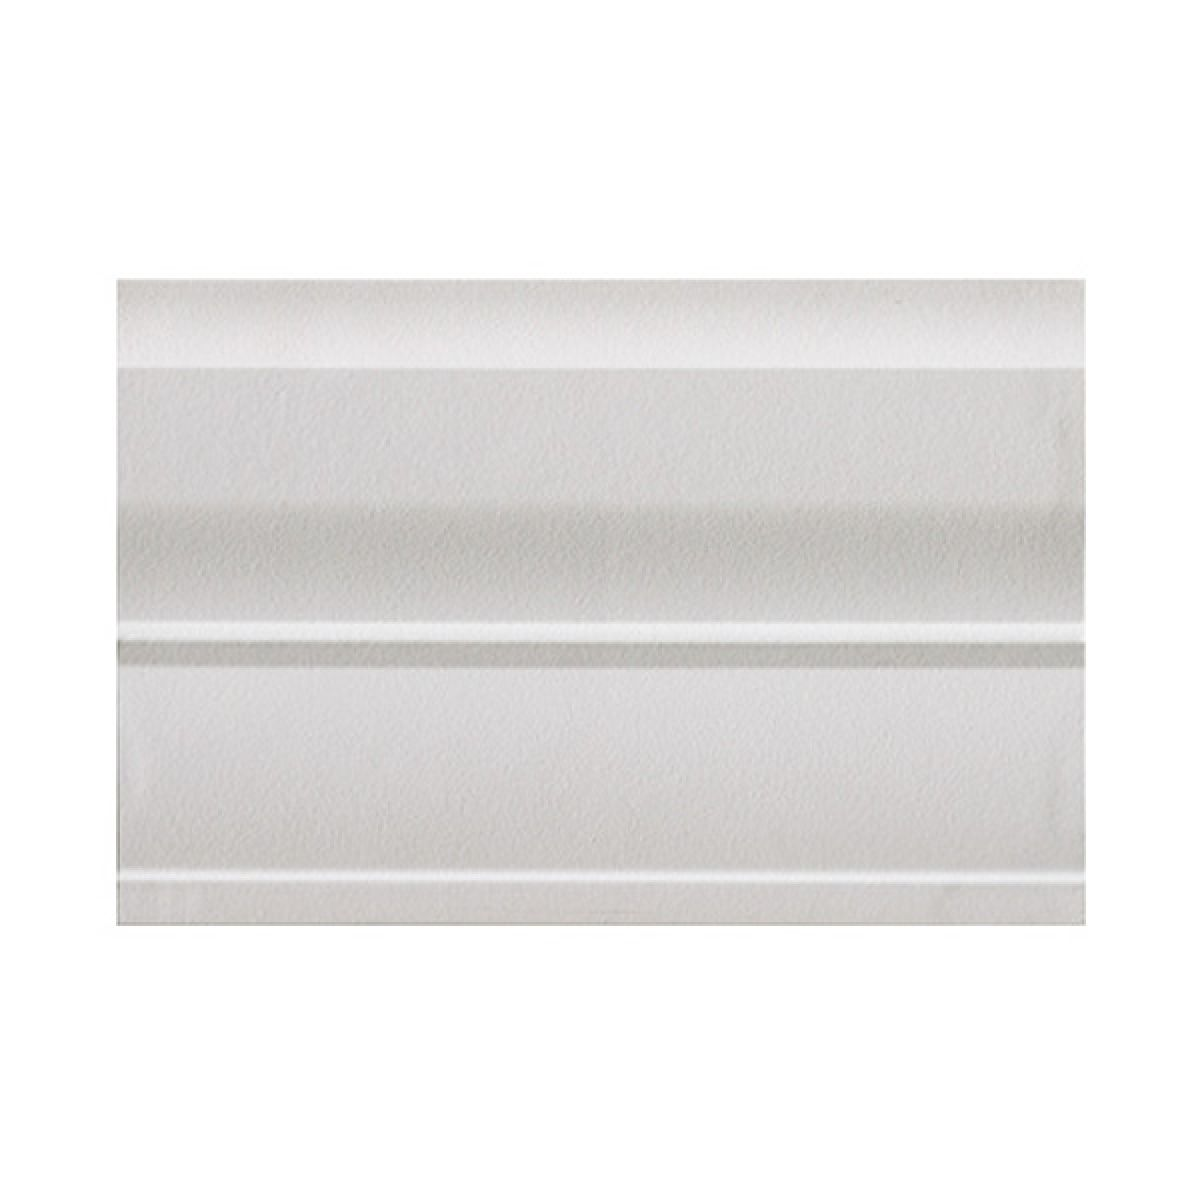 Imperial Bathrooms Edwardian Skirting Tile 20 X 30cm Uk